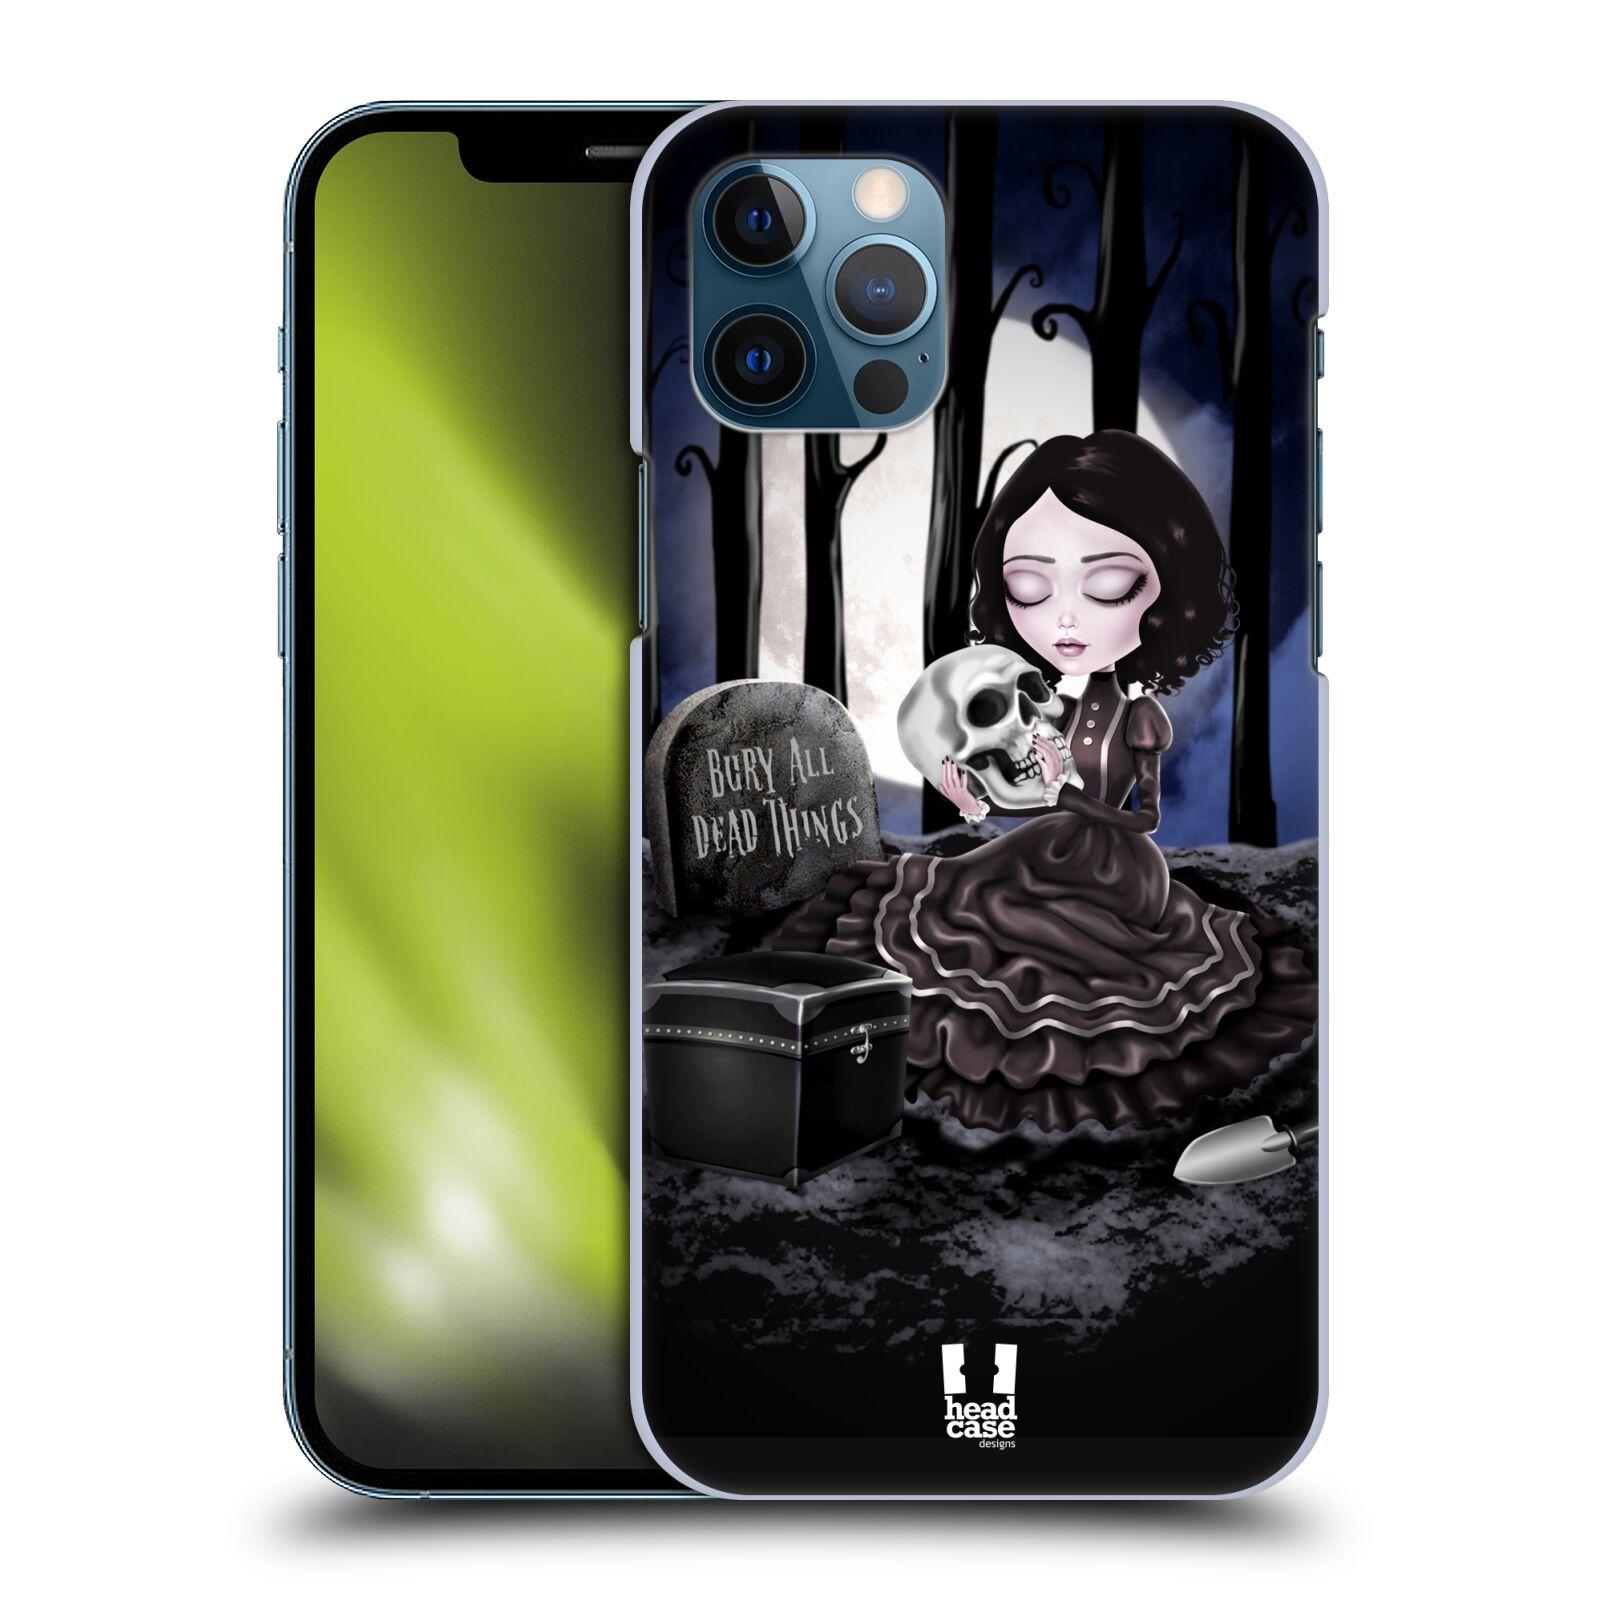 Plastové pouzdro na mobil Apple iPhone 12 / 12 Pro - Head Case - MACABRE HŘBITOV